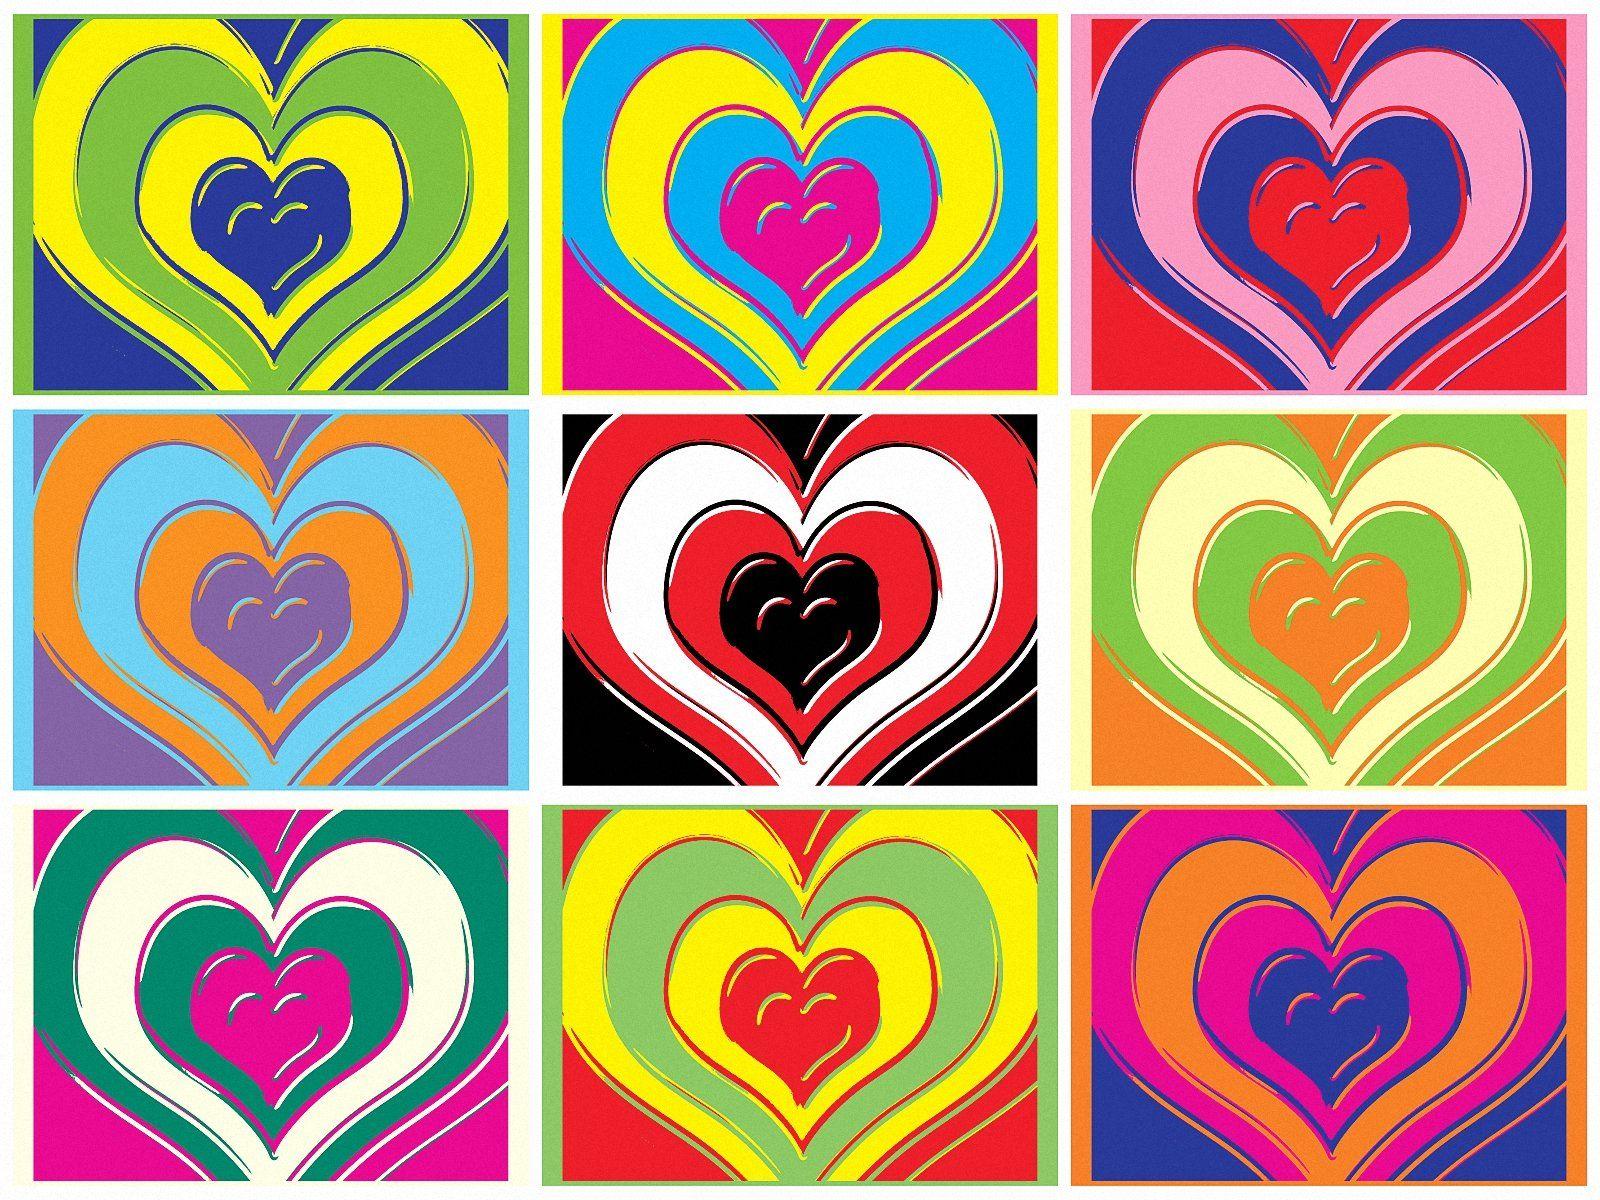 Bright Love Heart Pop Art Andy Warhol A4 Size Satin Paper